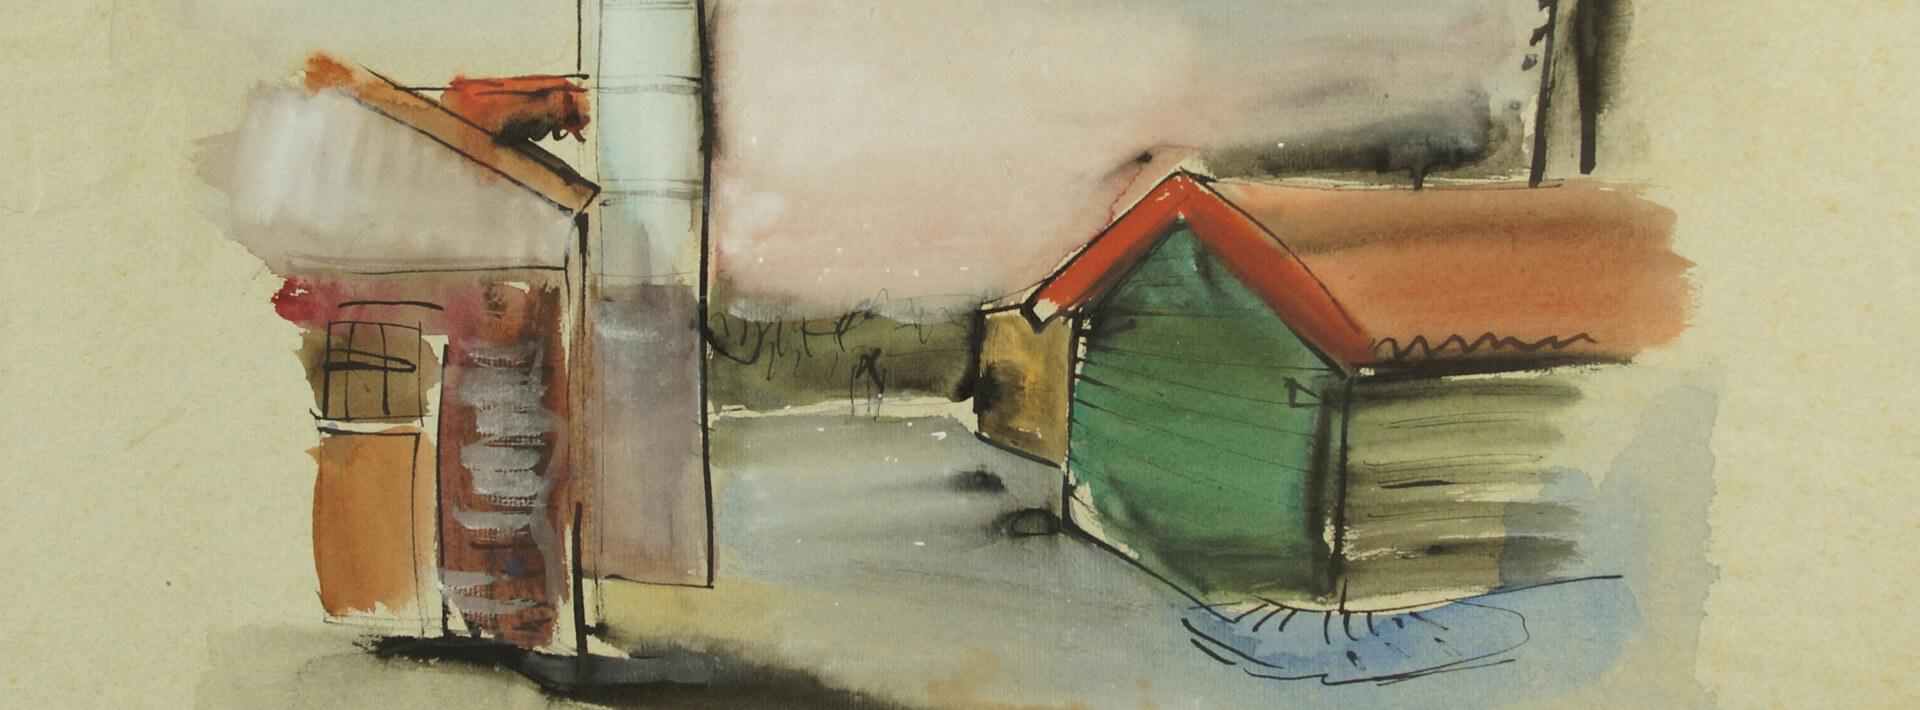 Gerhard-Marcks-Haus Auswärtsausstellungen